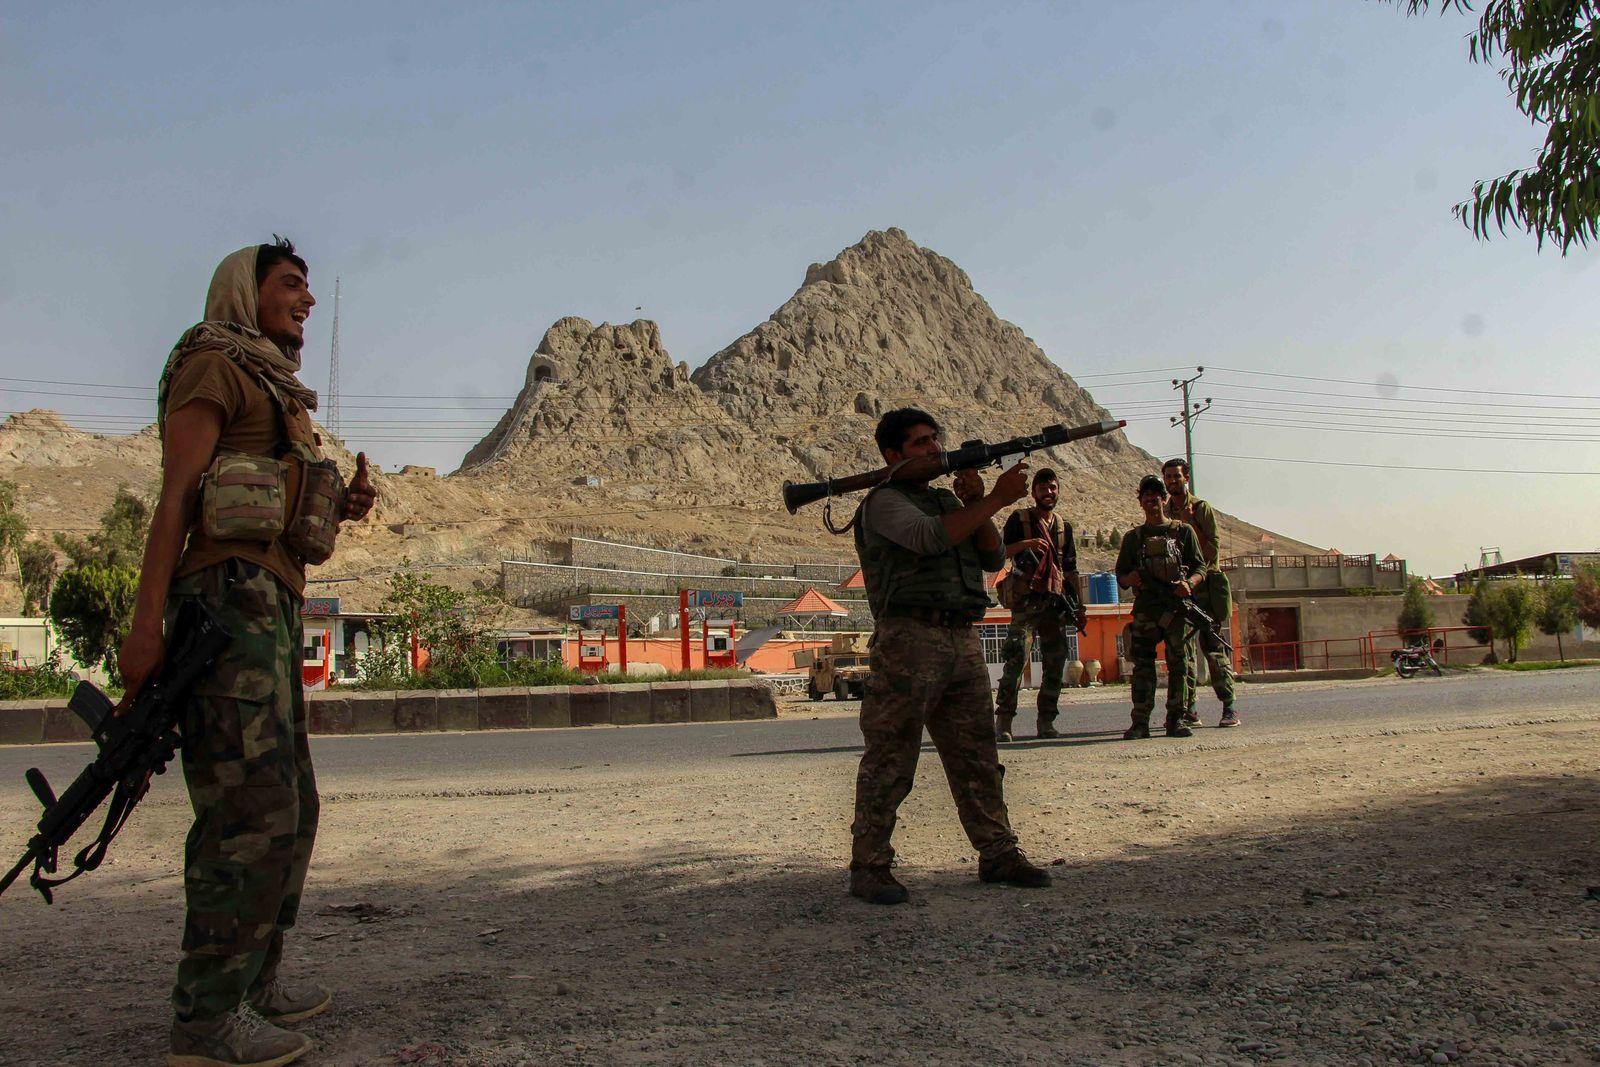 Afghan Taliban captured Spin Boldak border district near Kandahar, Afghanistan